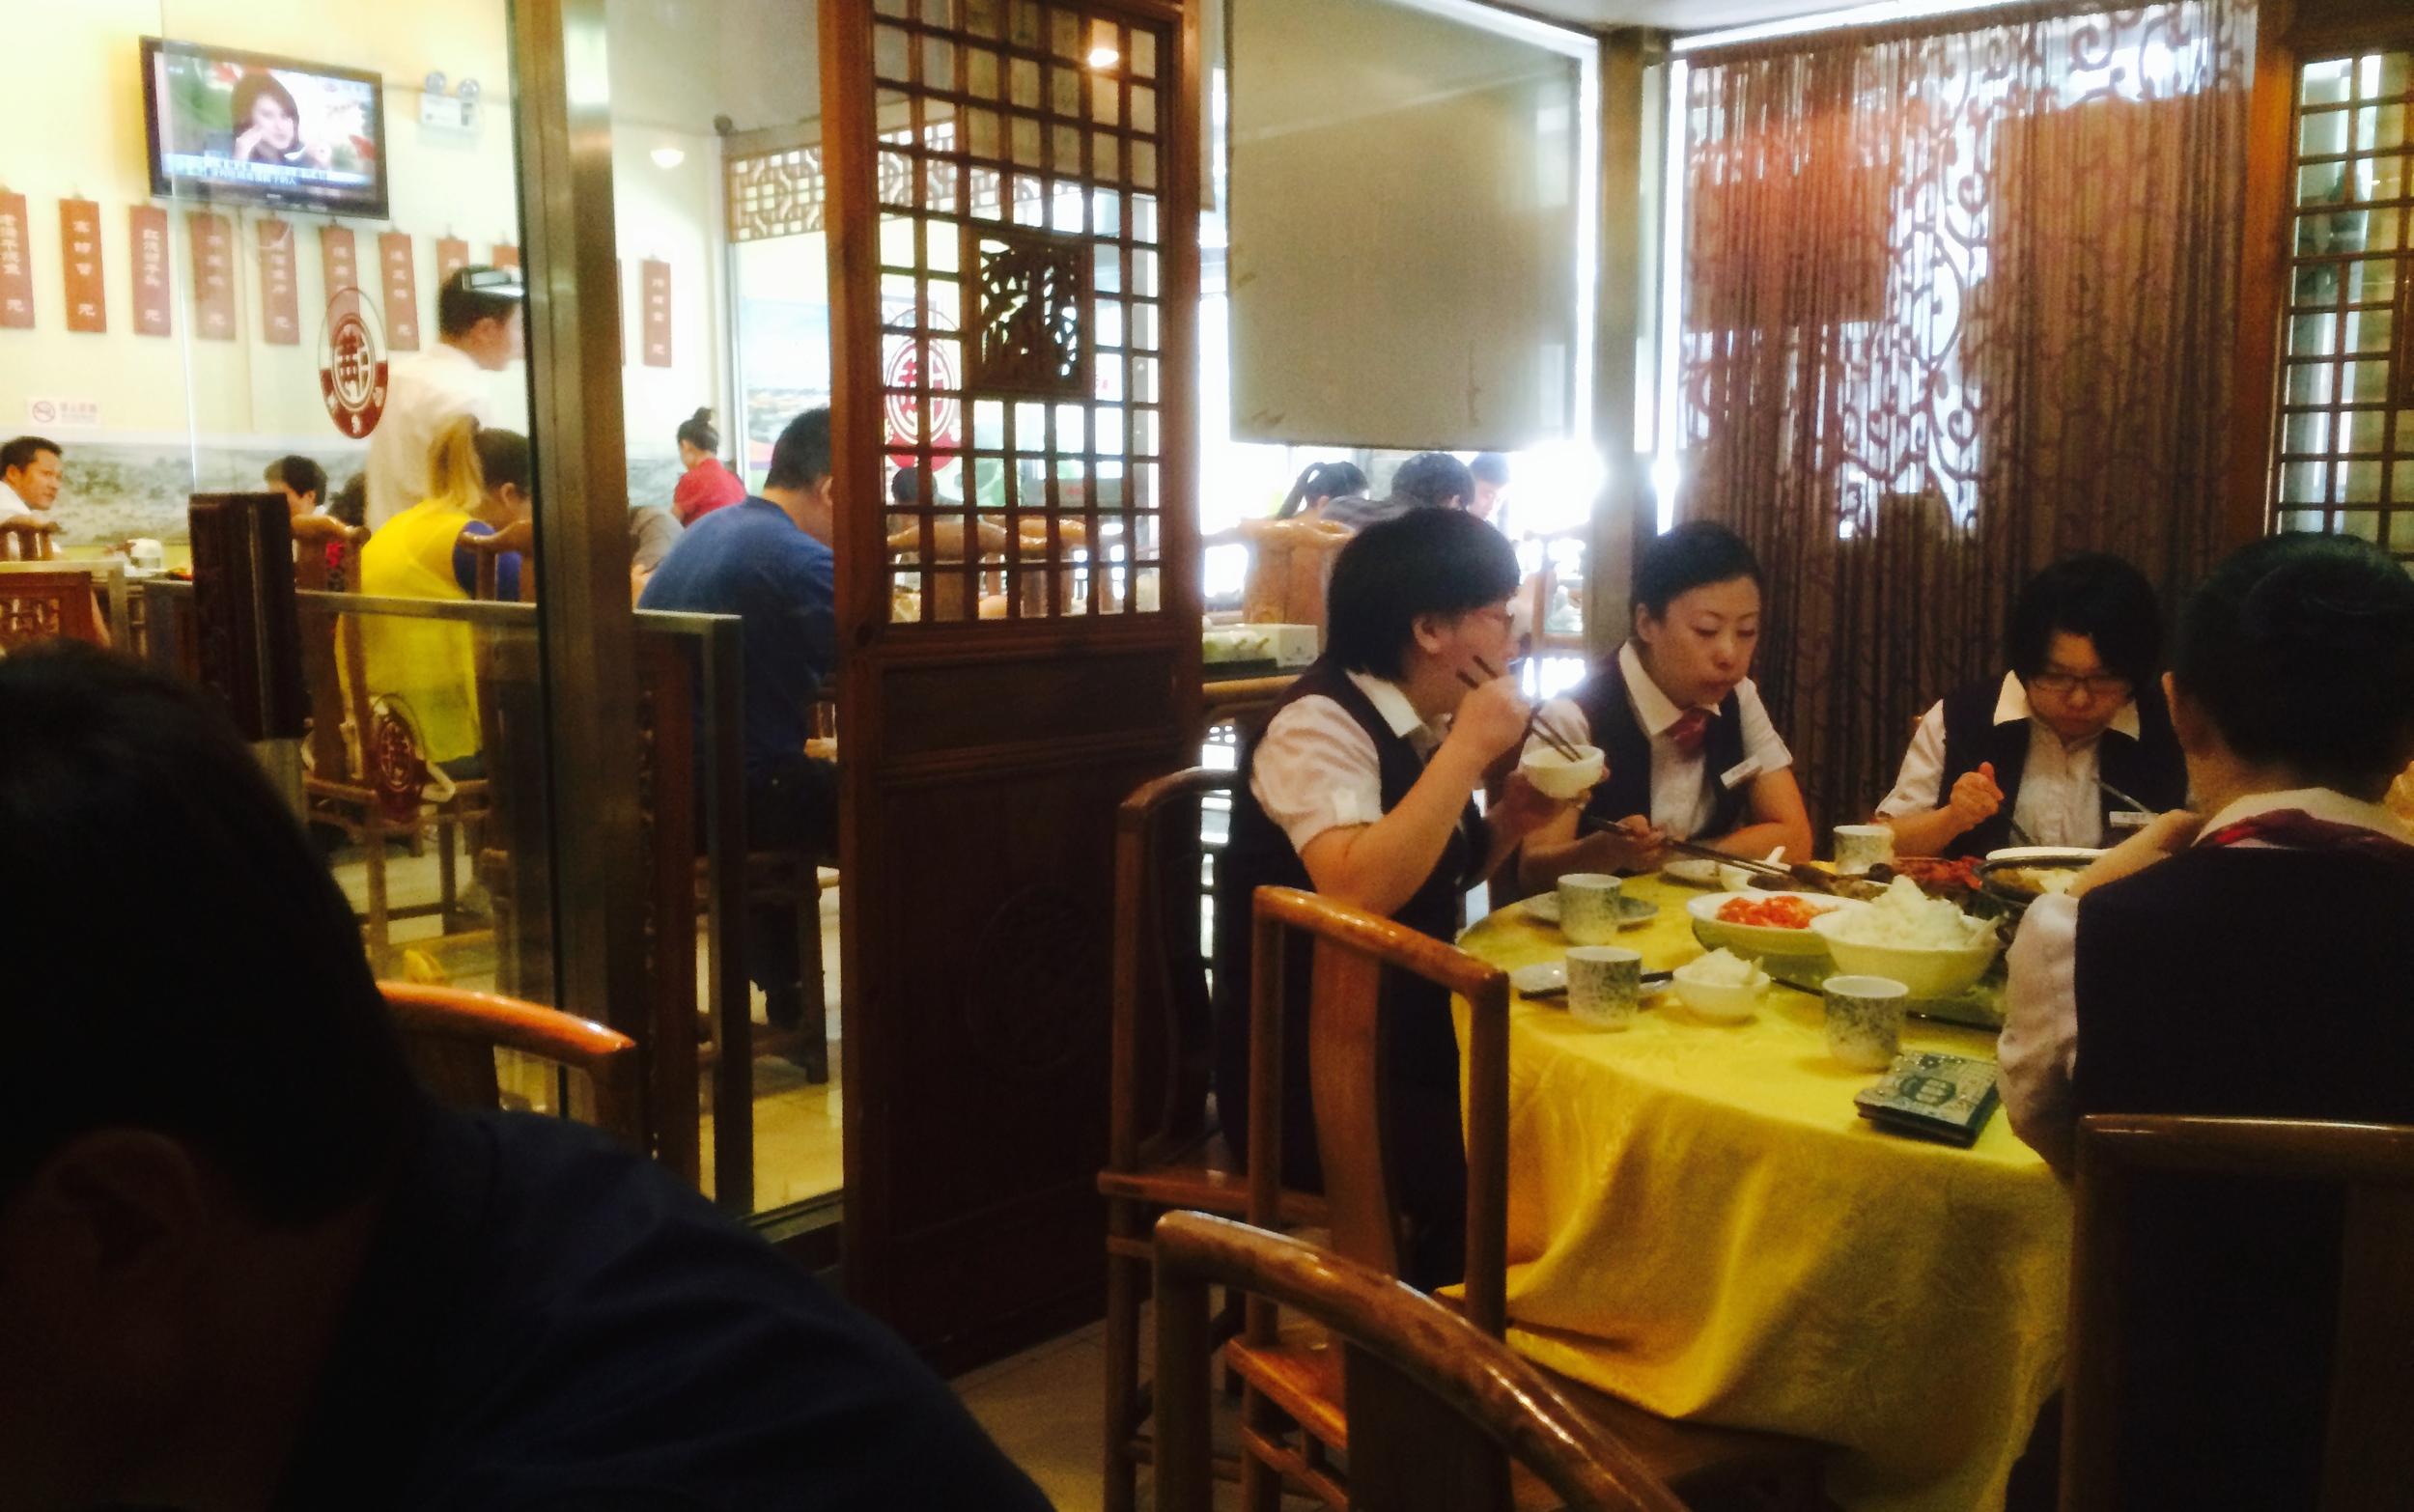 lunch stop for dumplings